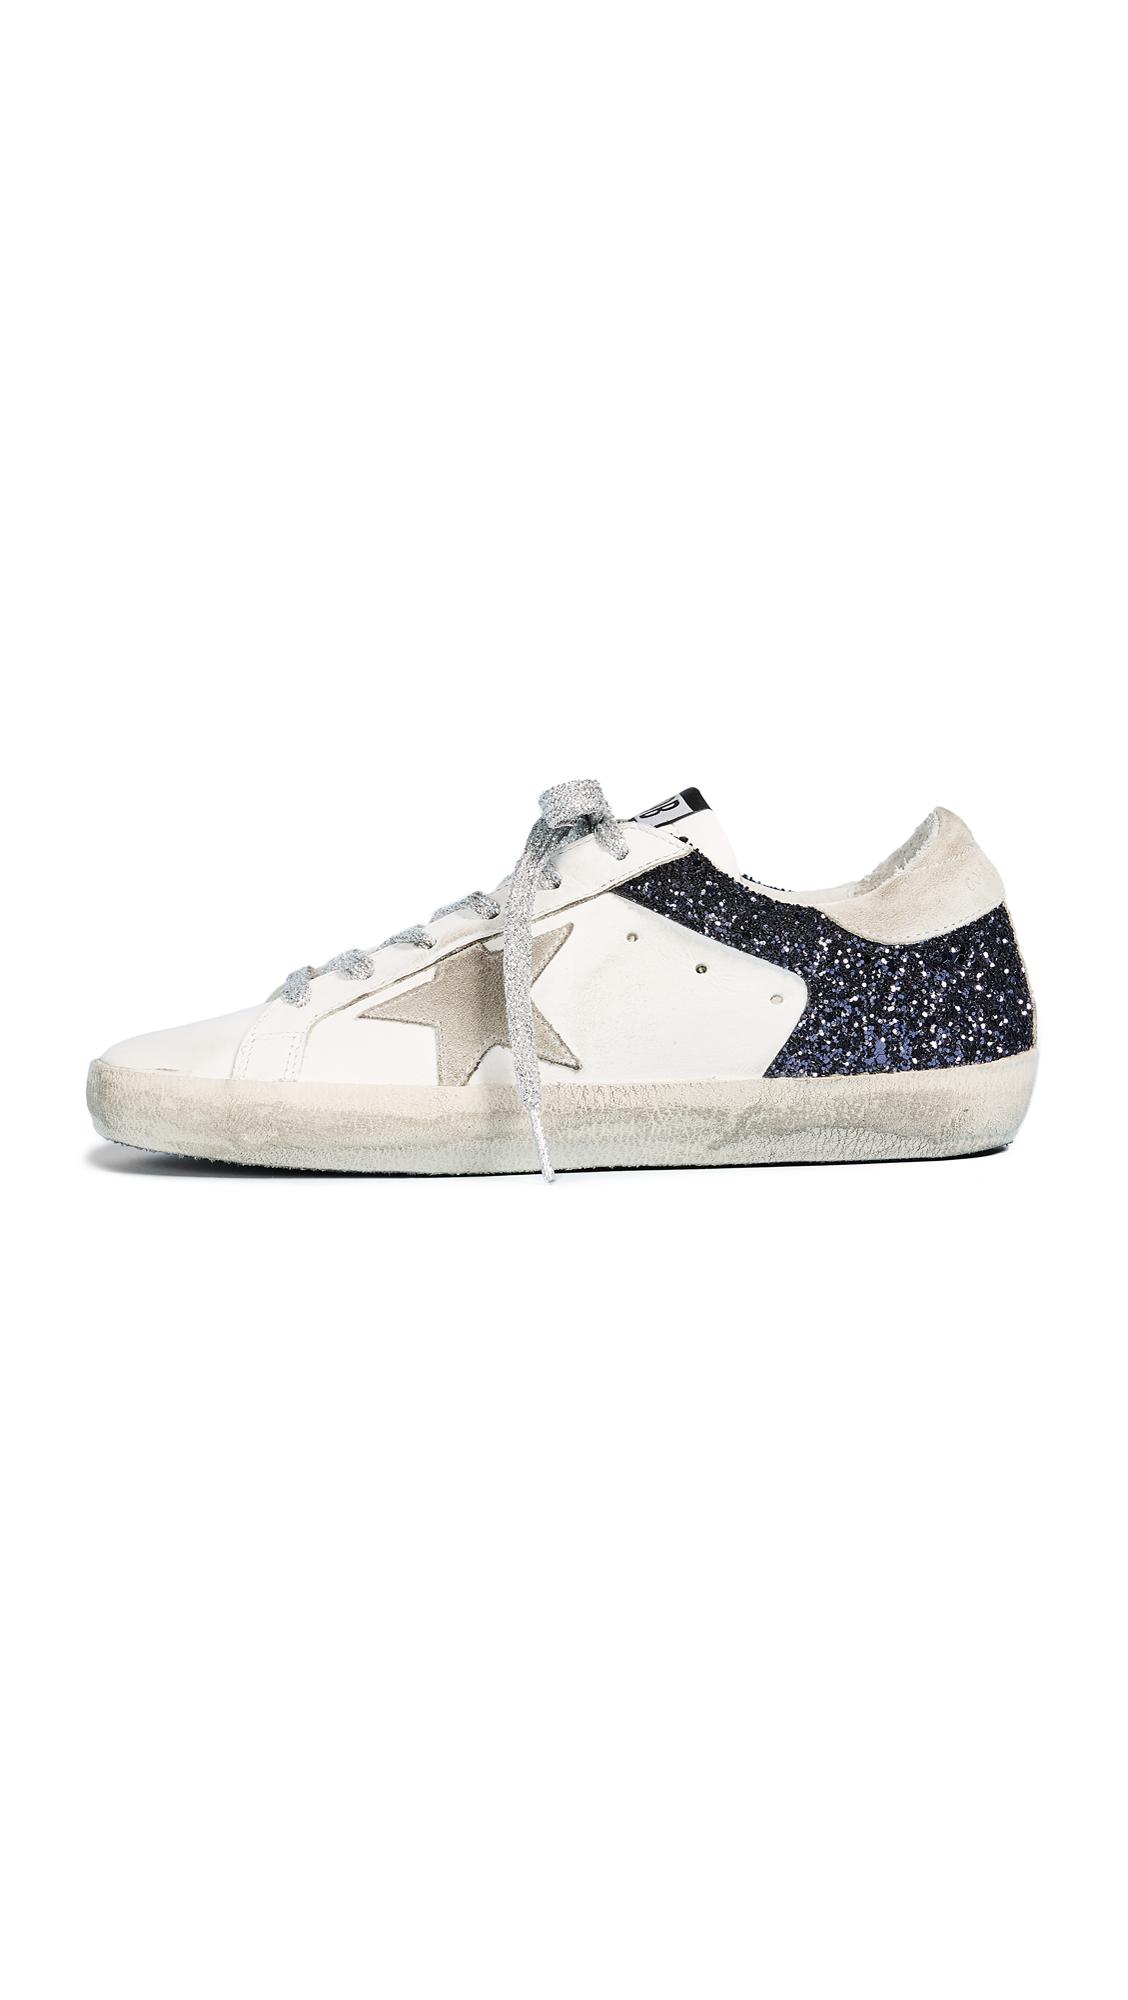 Golden Goose Superstar Sneakers - White/Navy